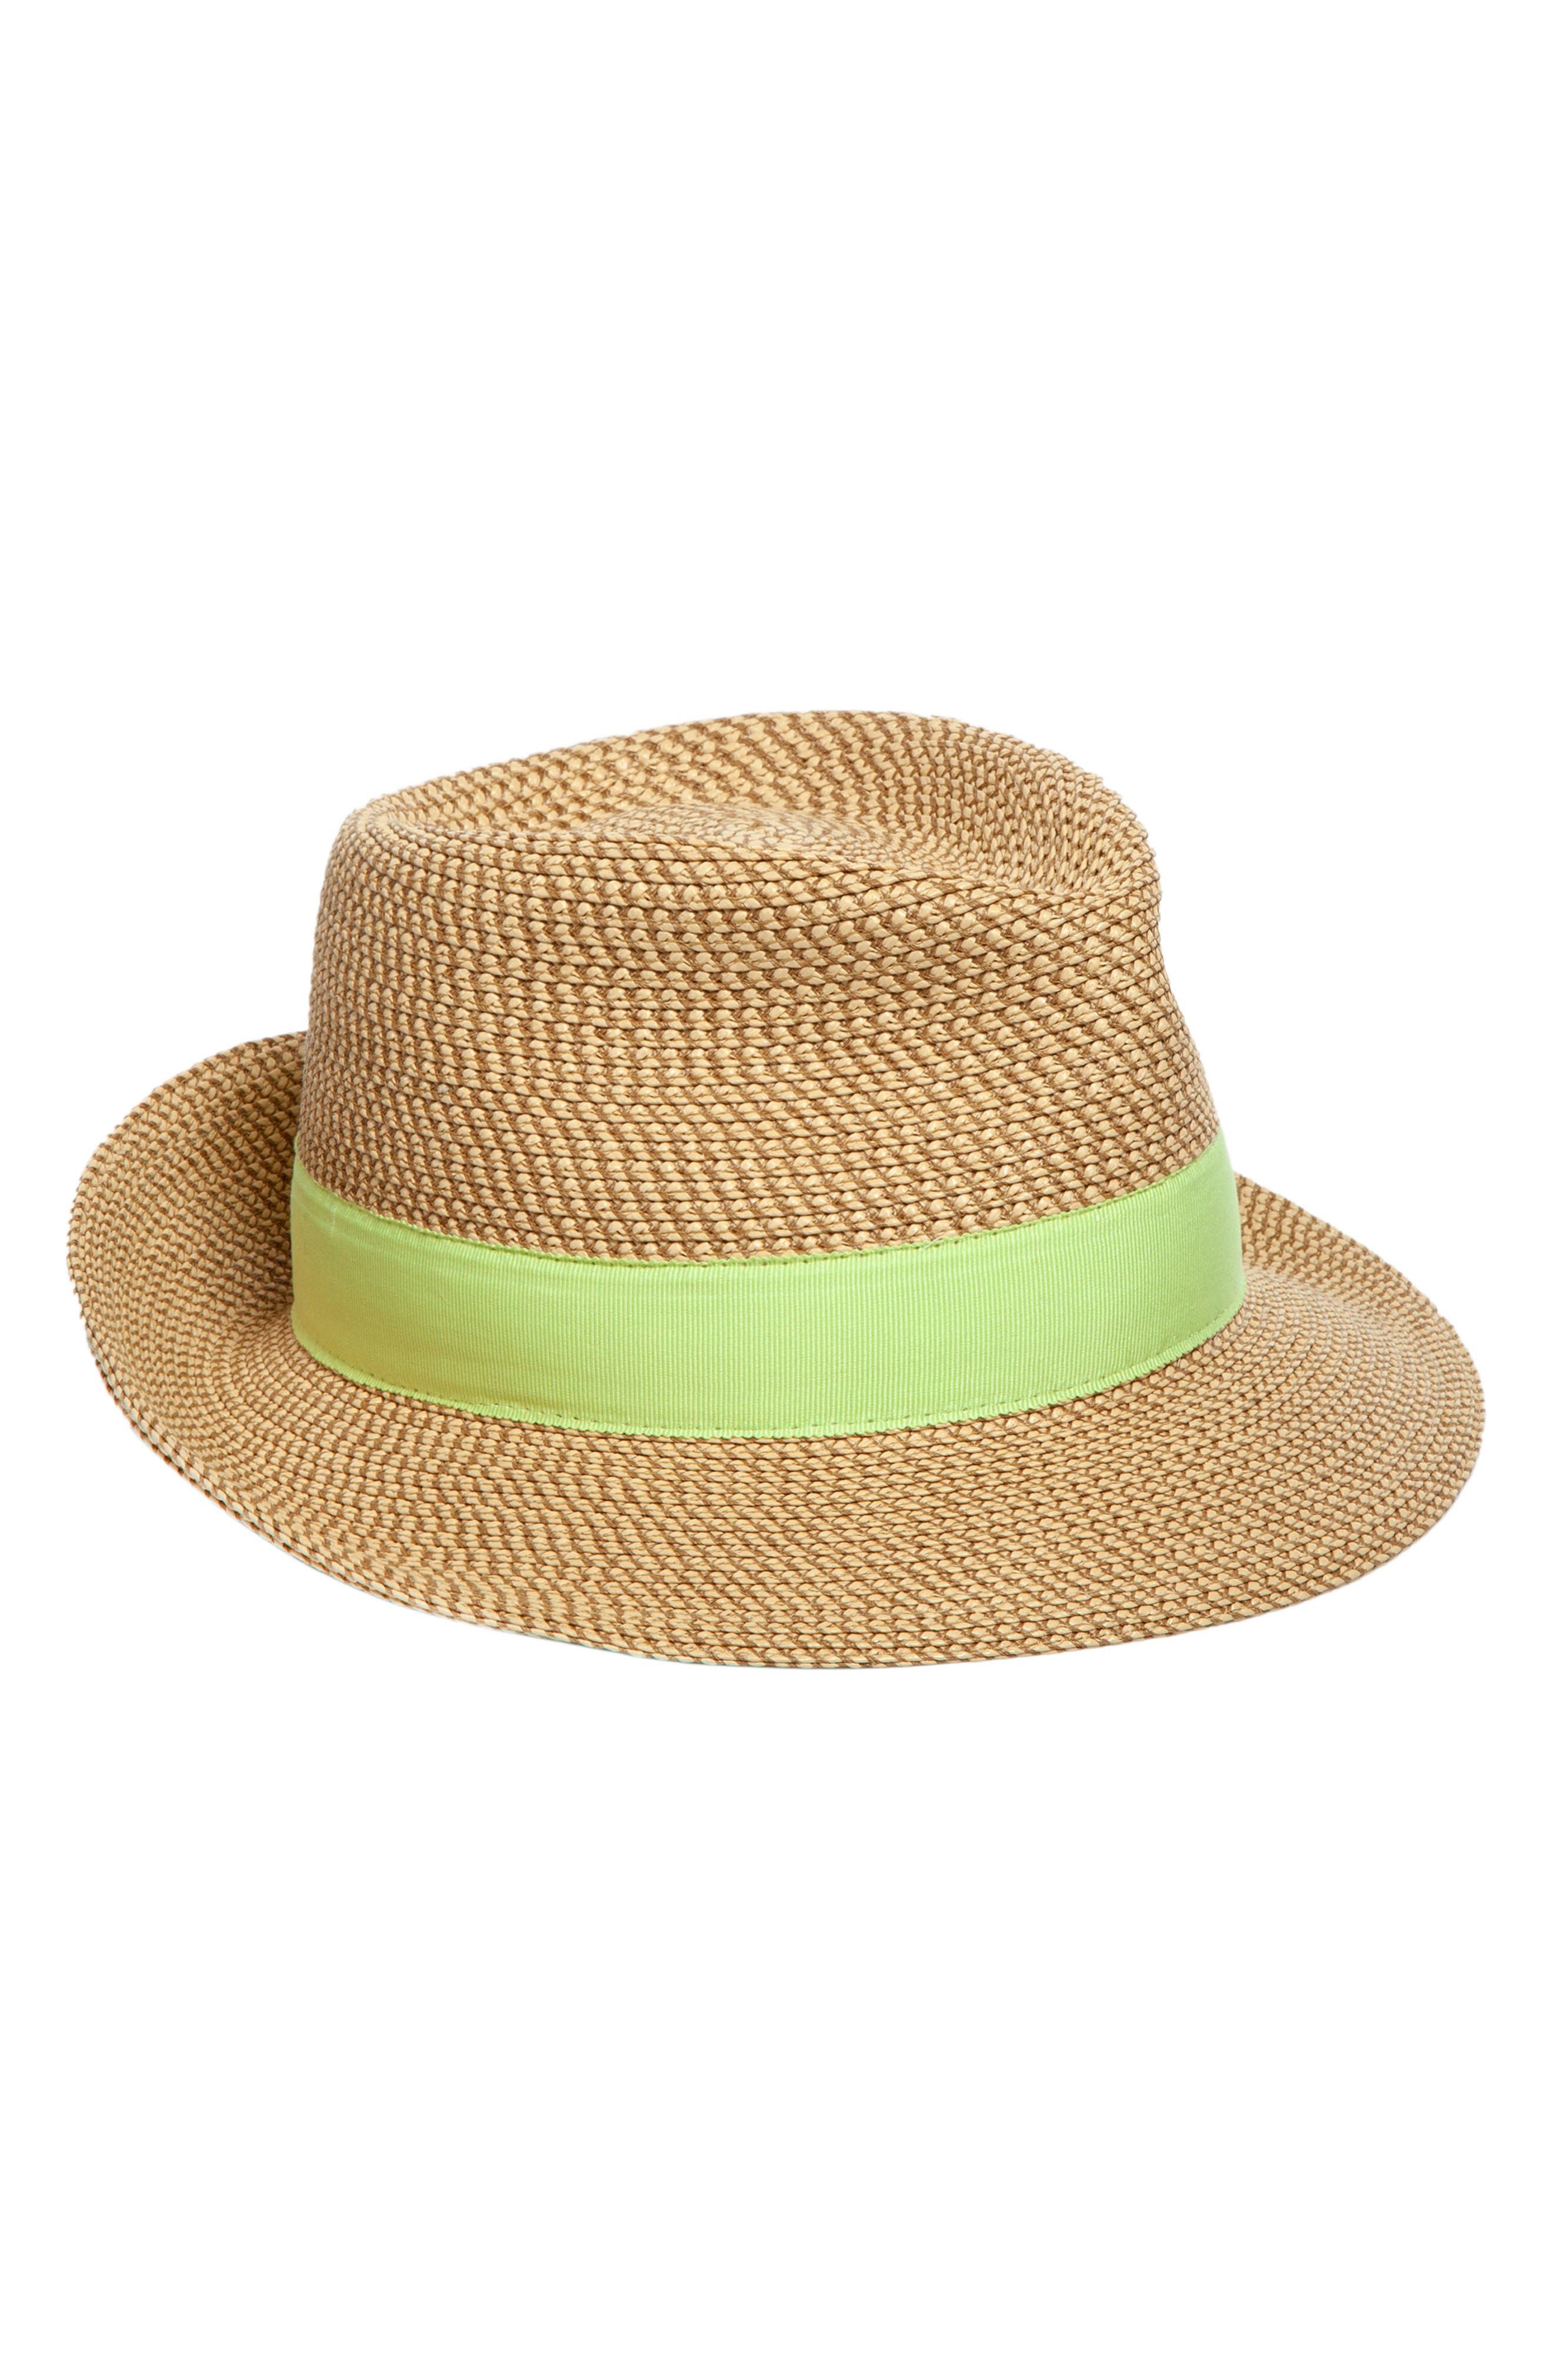 c206b93b Women's Fedoras & Panama Hats | Nordstrom